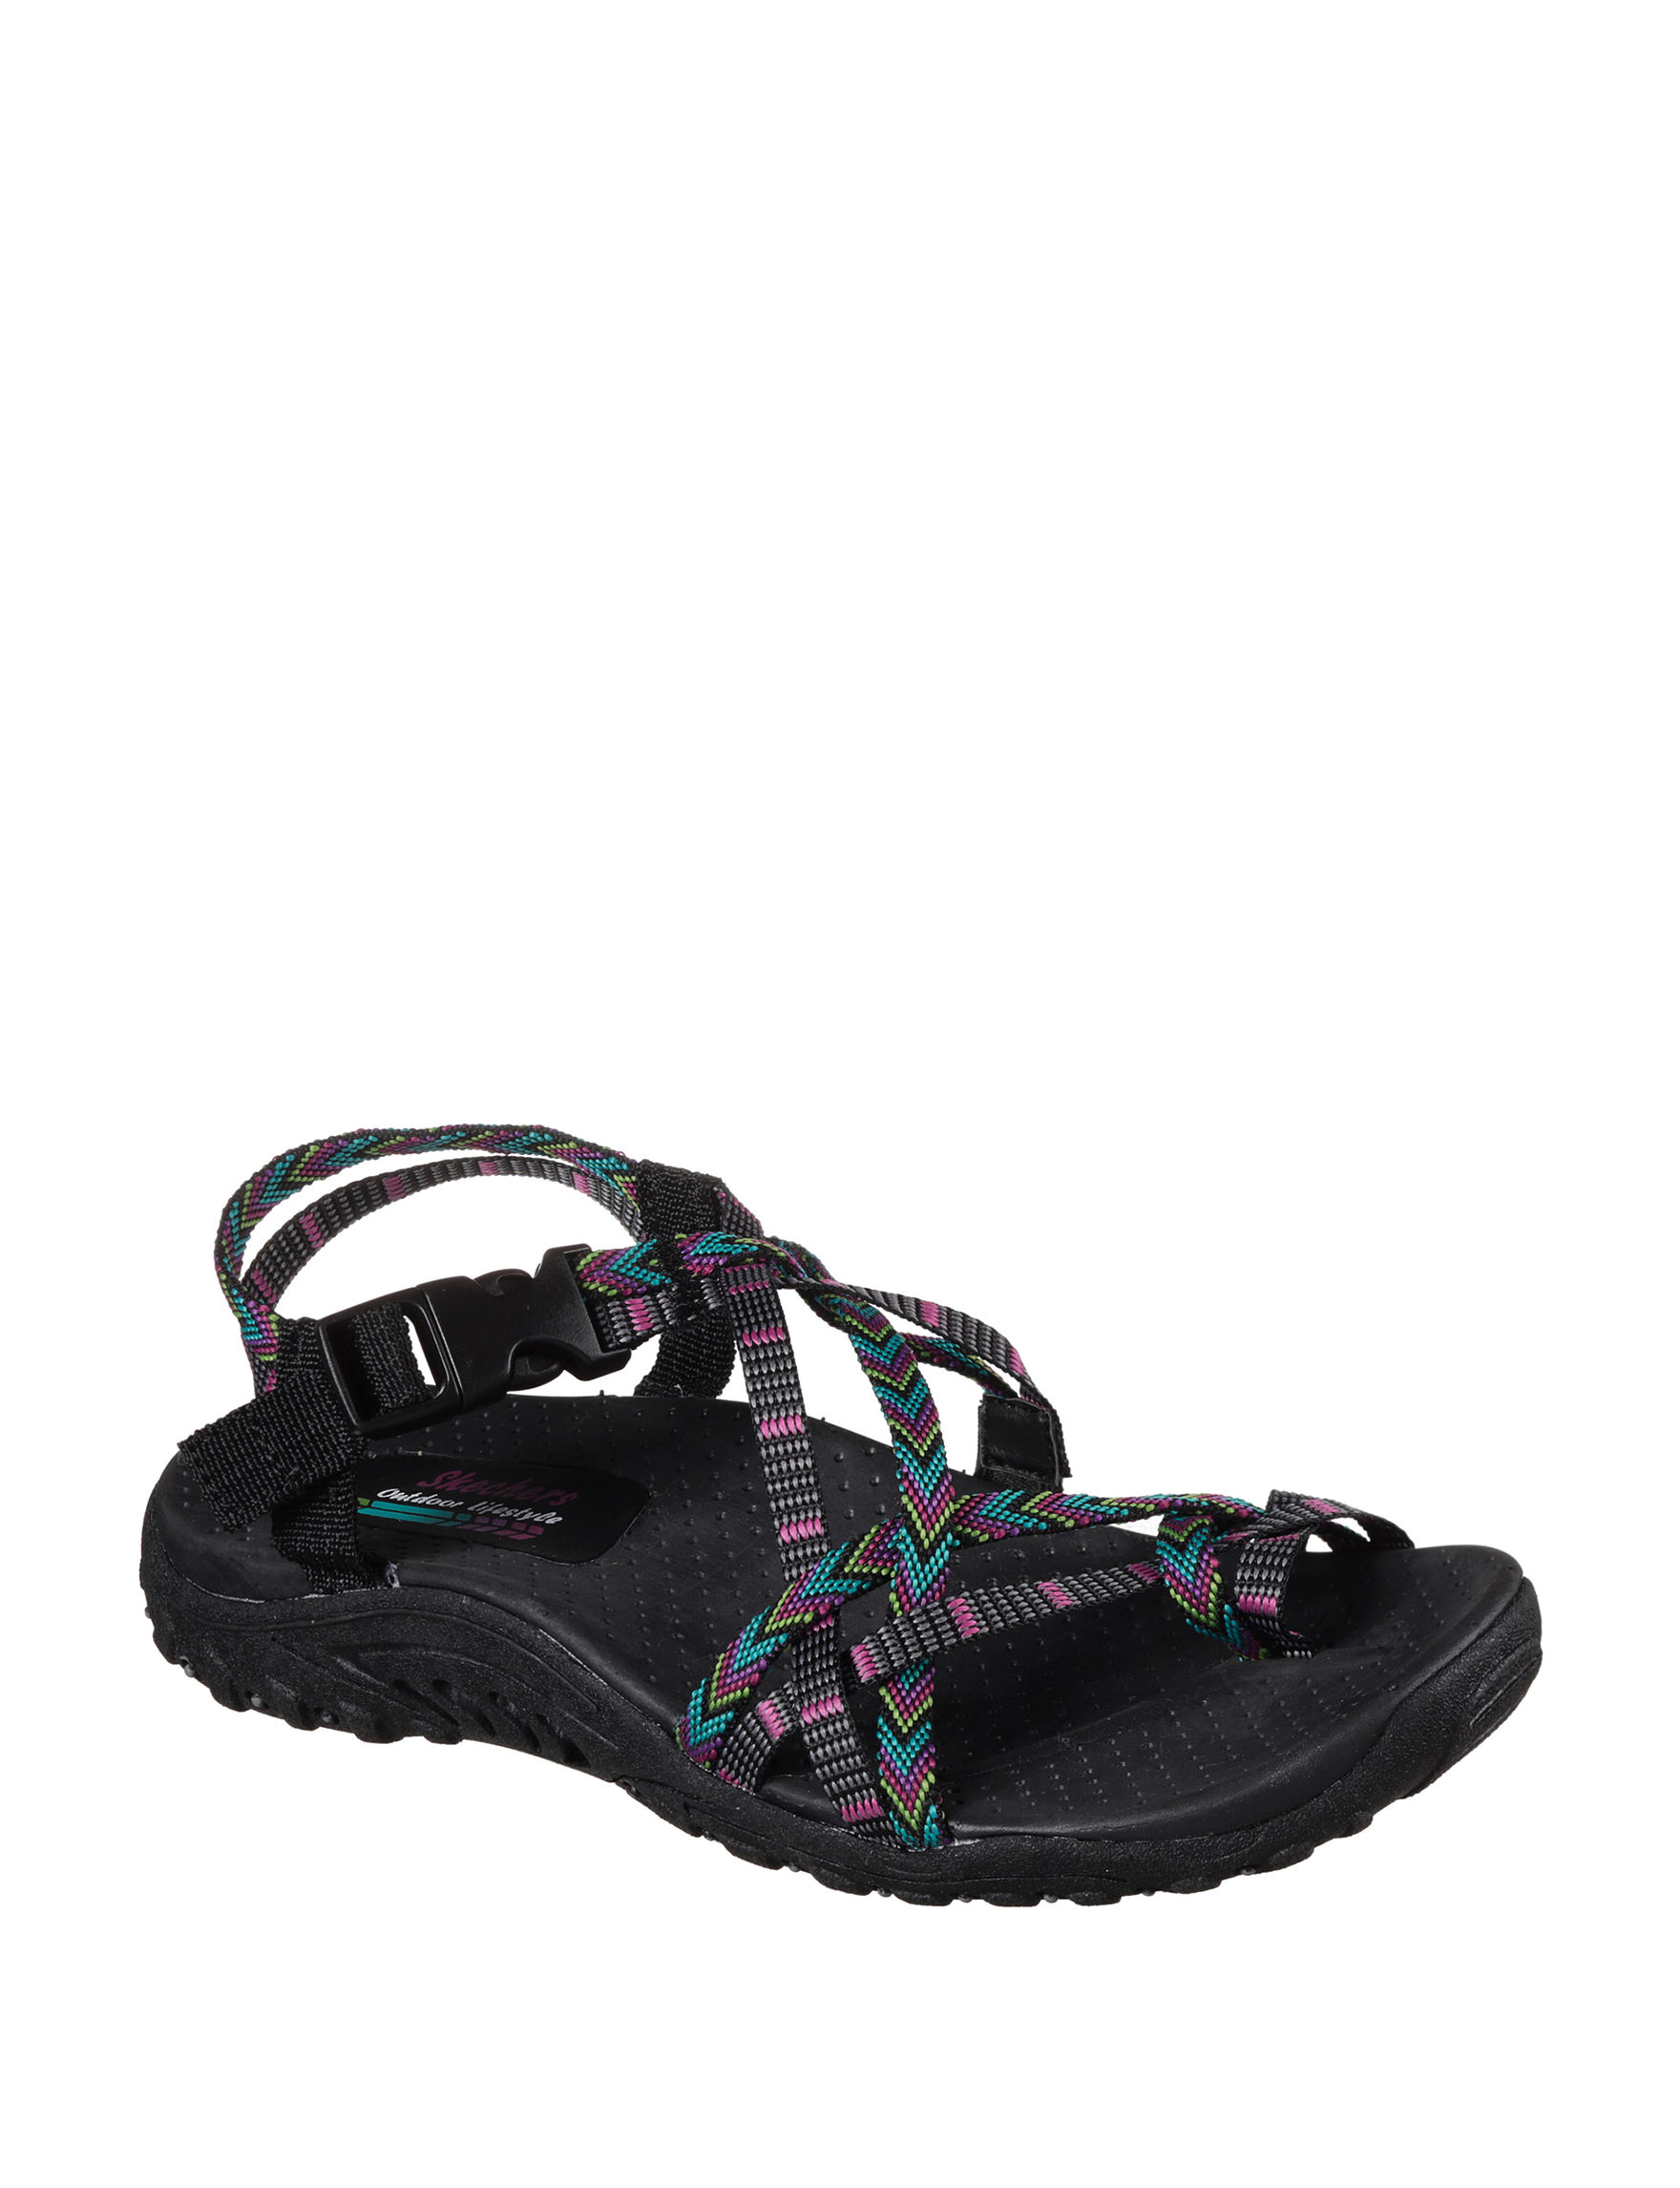 Skechers Black Multi Sport Sandals